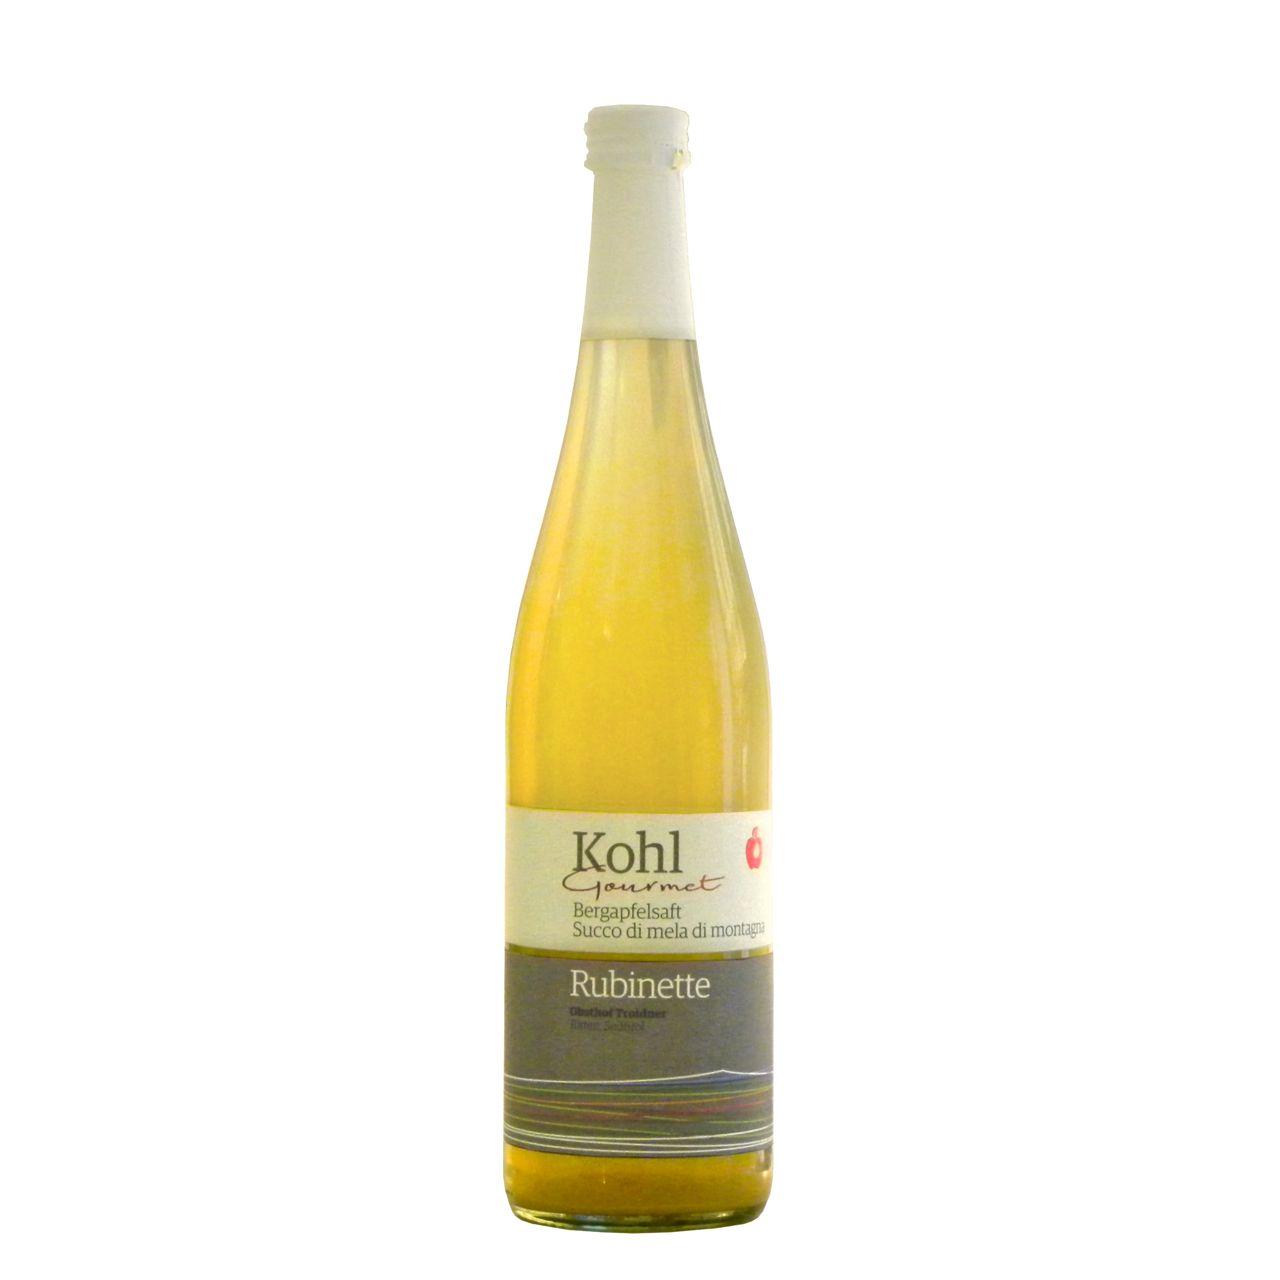 Succo di mele Rubinette Kohl – Kohl Rubinette apple juice – Gustorotondo – Italian food boutique